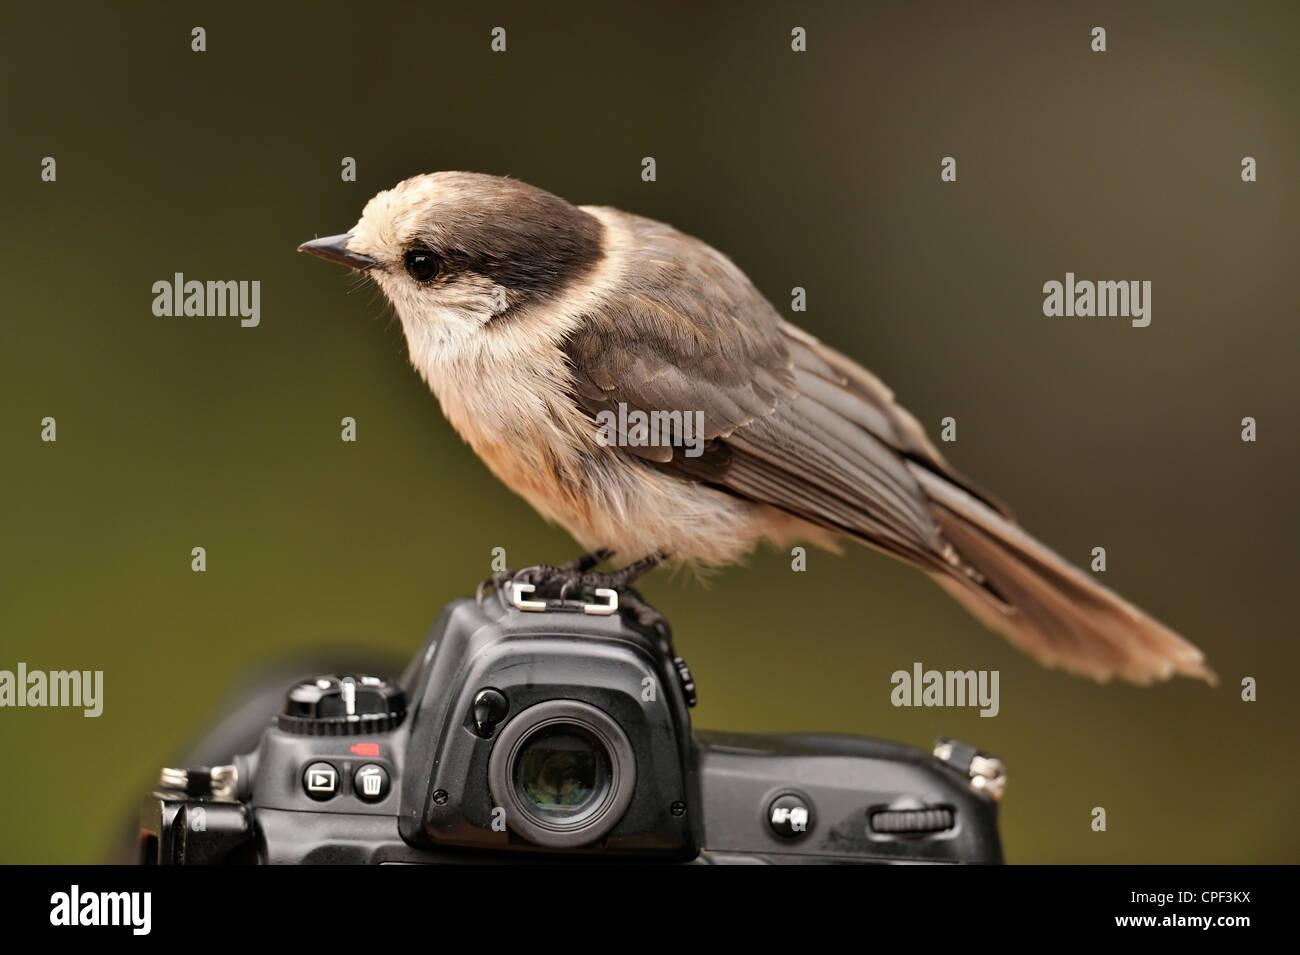 Gray jay (Perisoreus canadensis) Perched on a Nikon camera